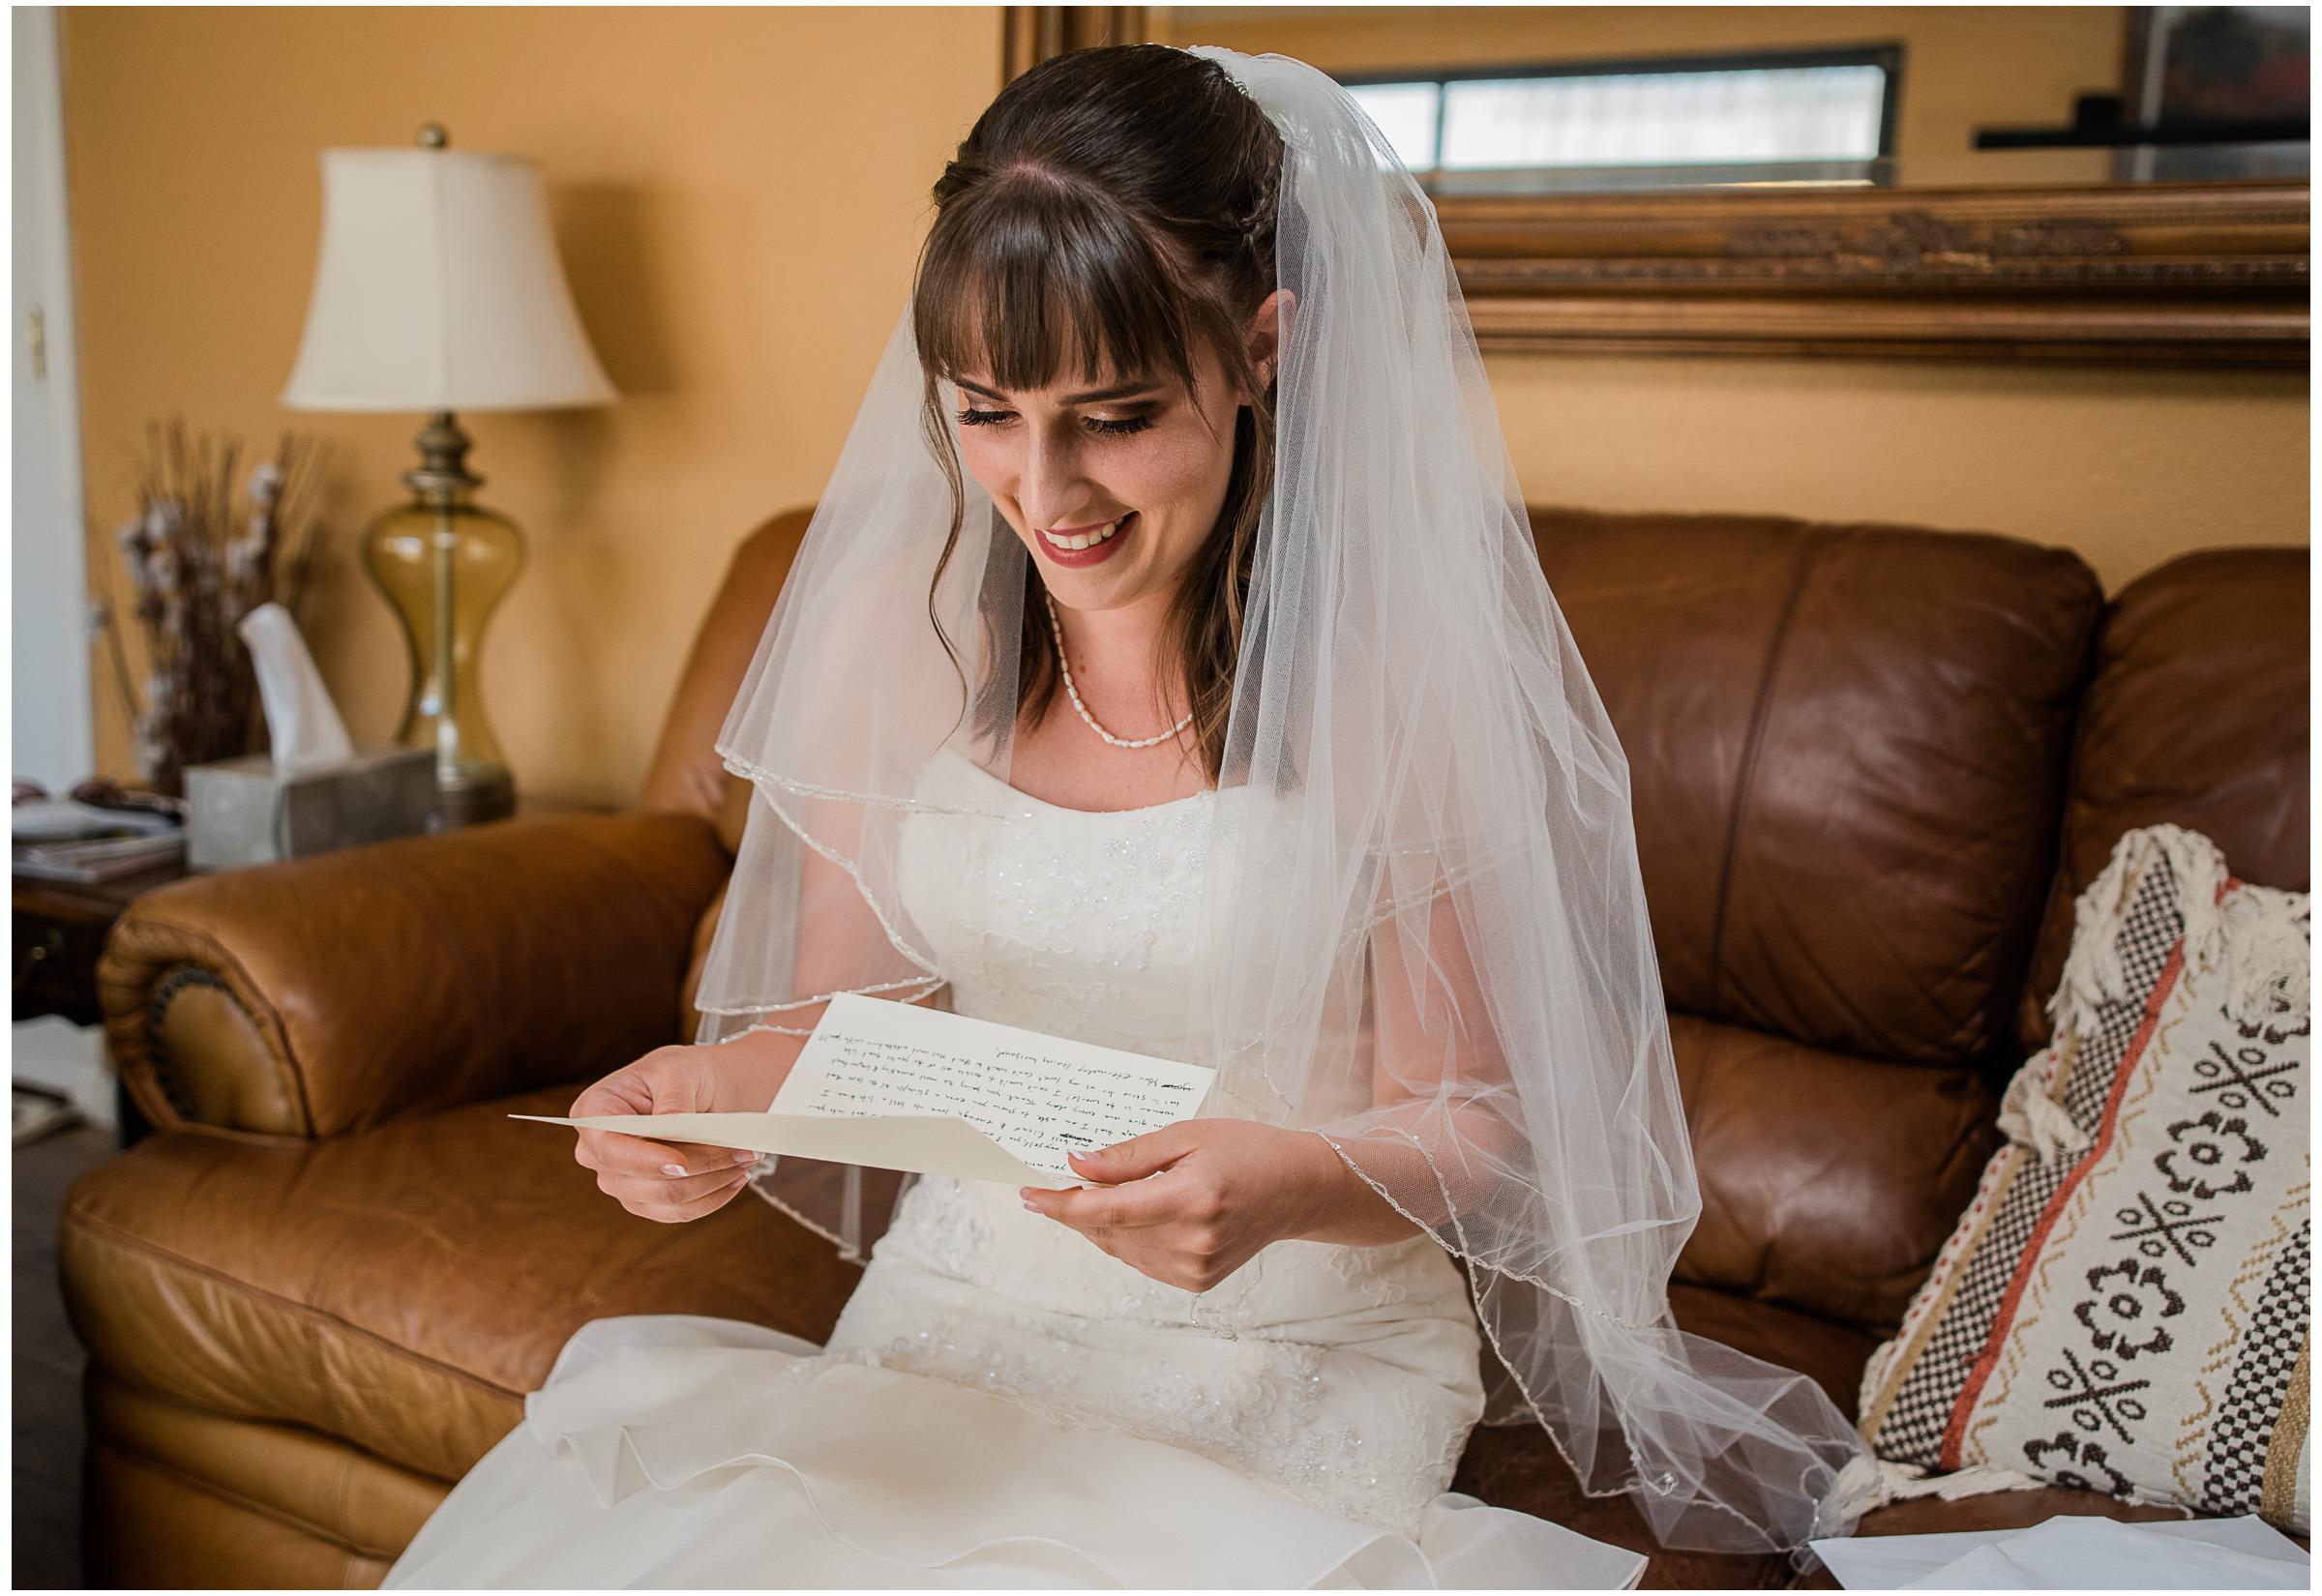 Placerville Wedding - Sacramento Photographer - Justin Wilcox Photography - 6.jpg